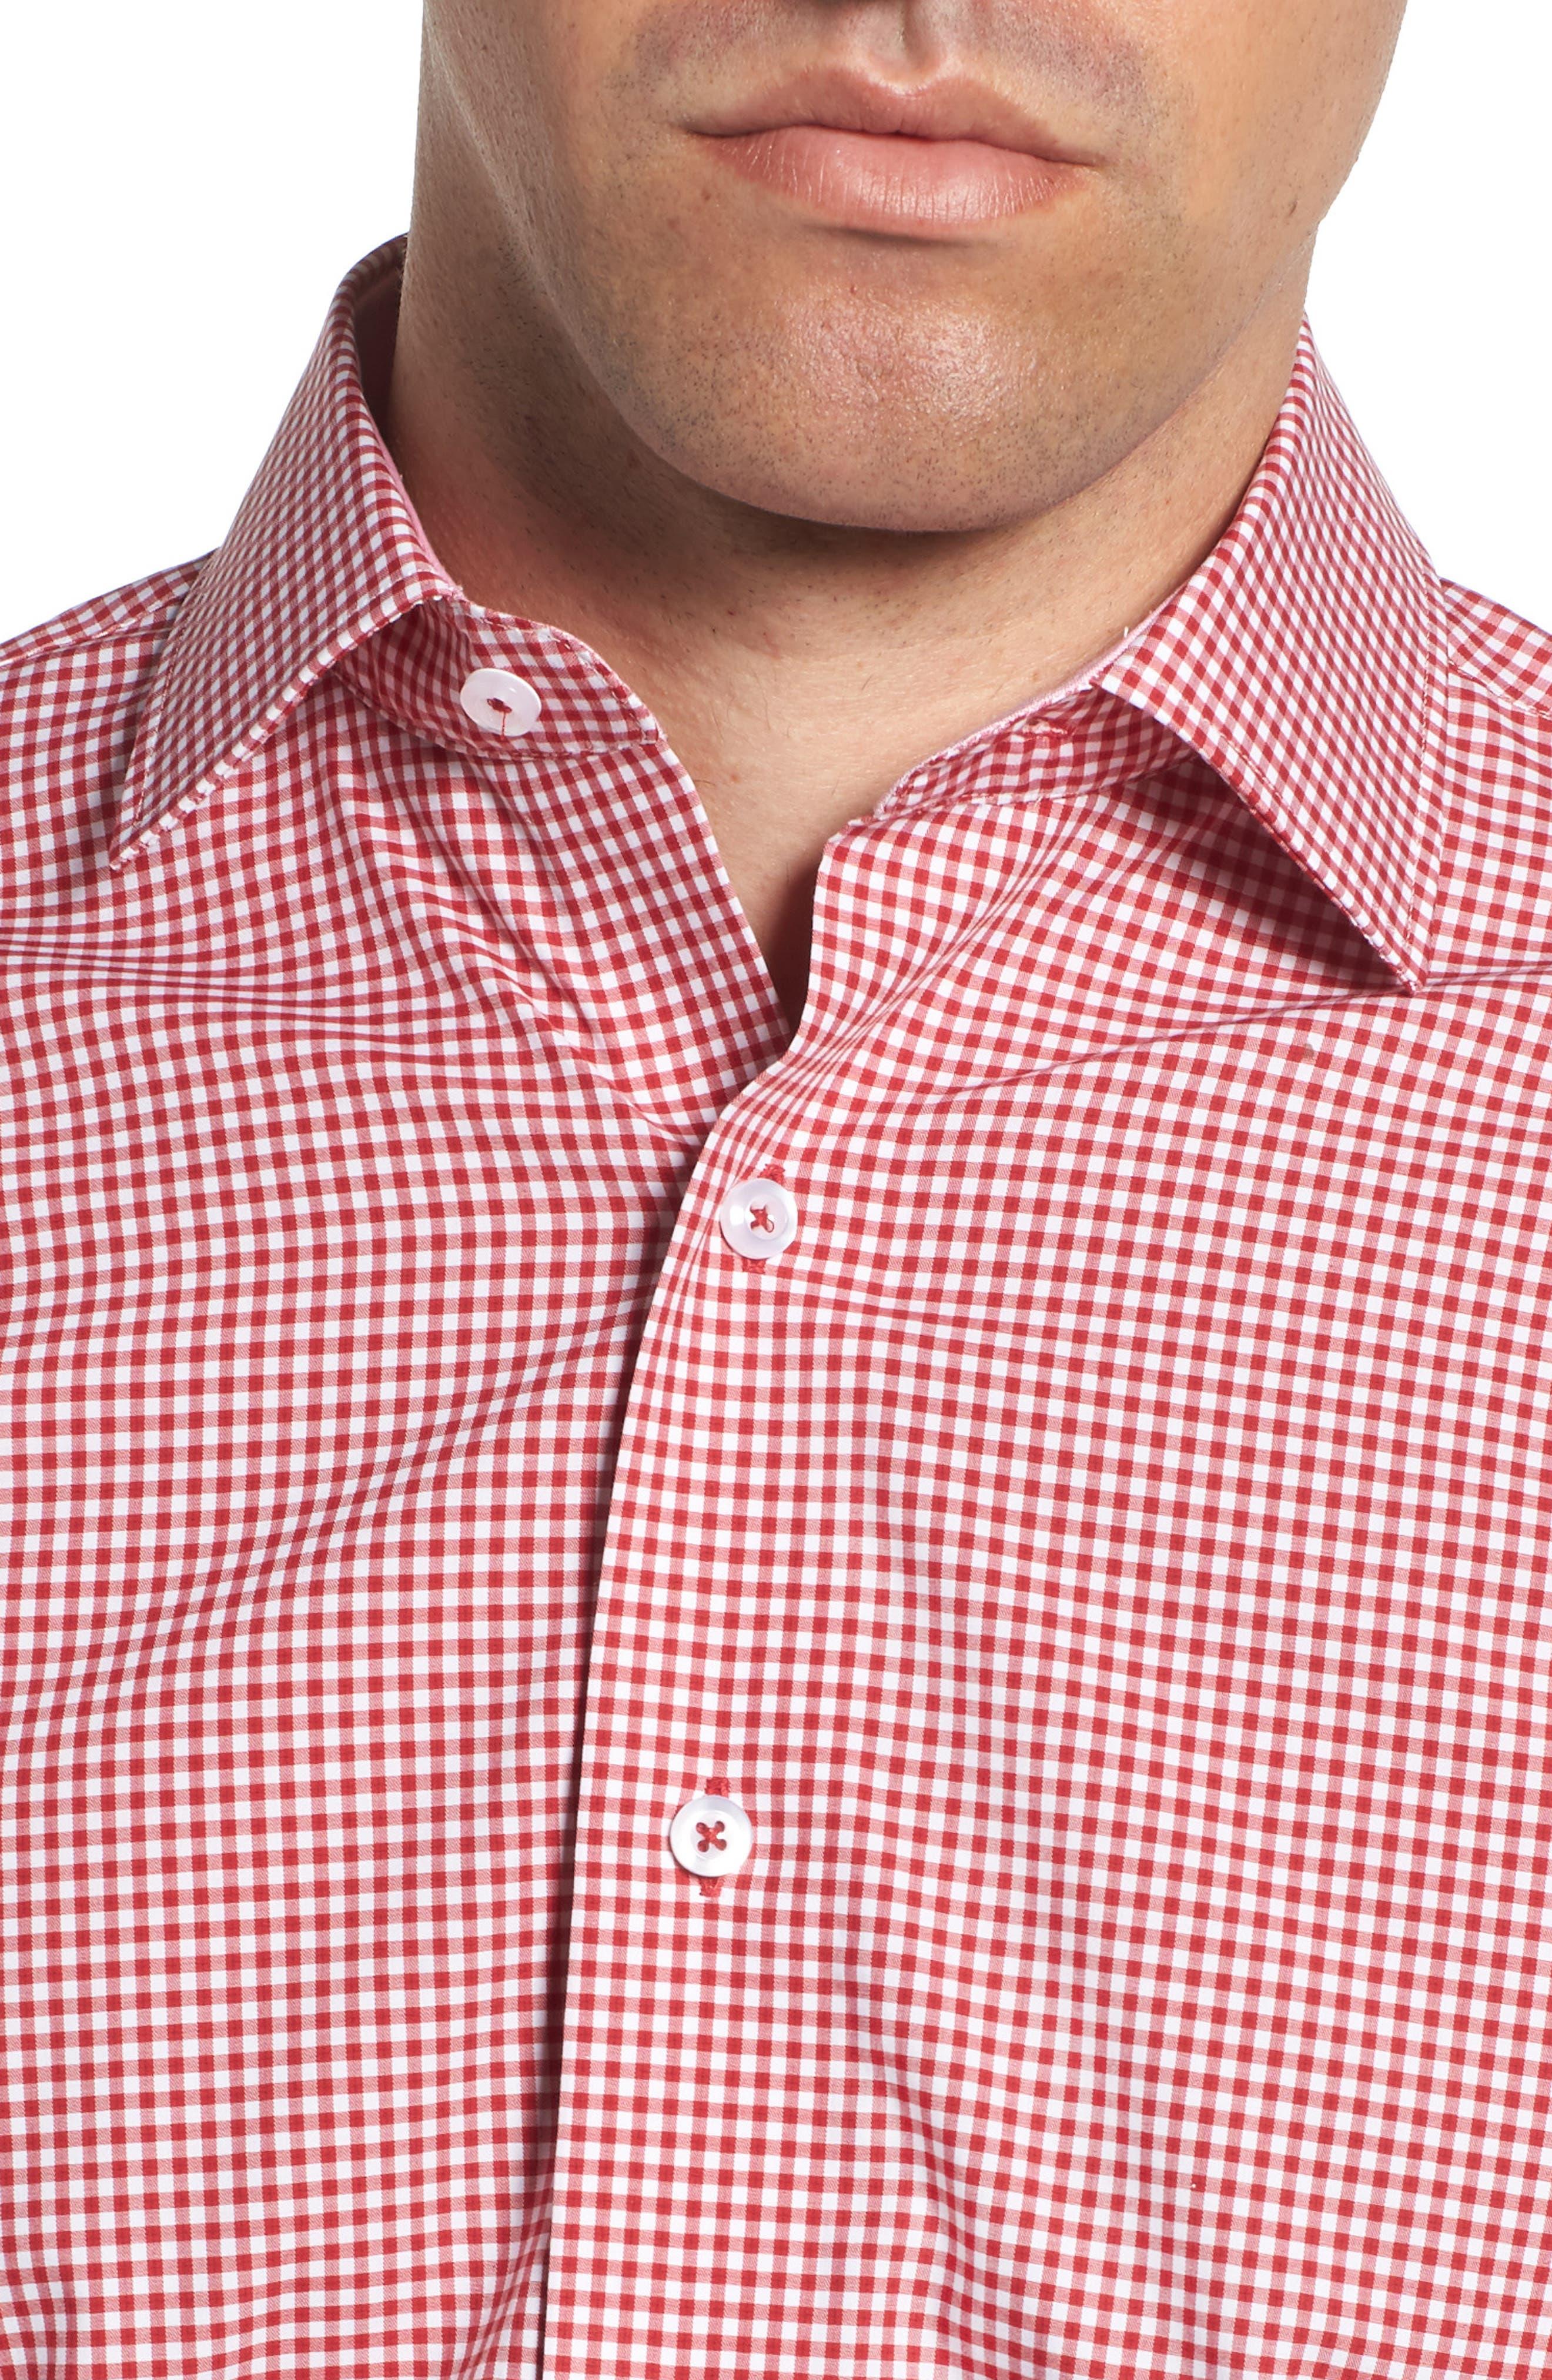 Trim Fit Check Dress Shirt,                             Alternate thumbnail 2, color,                             Red